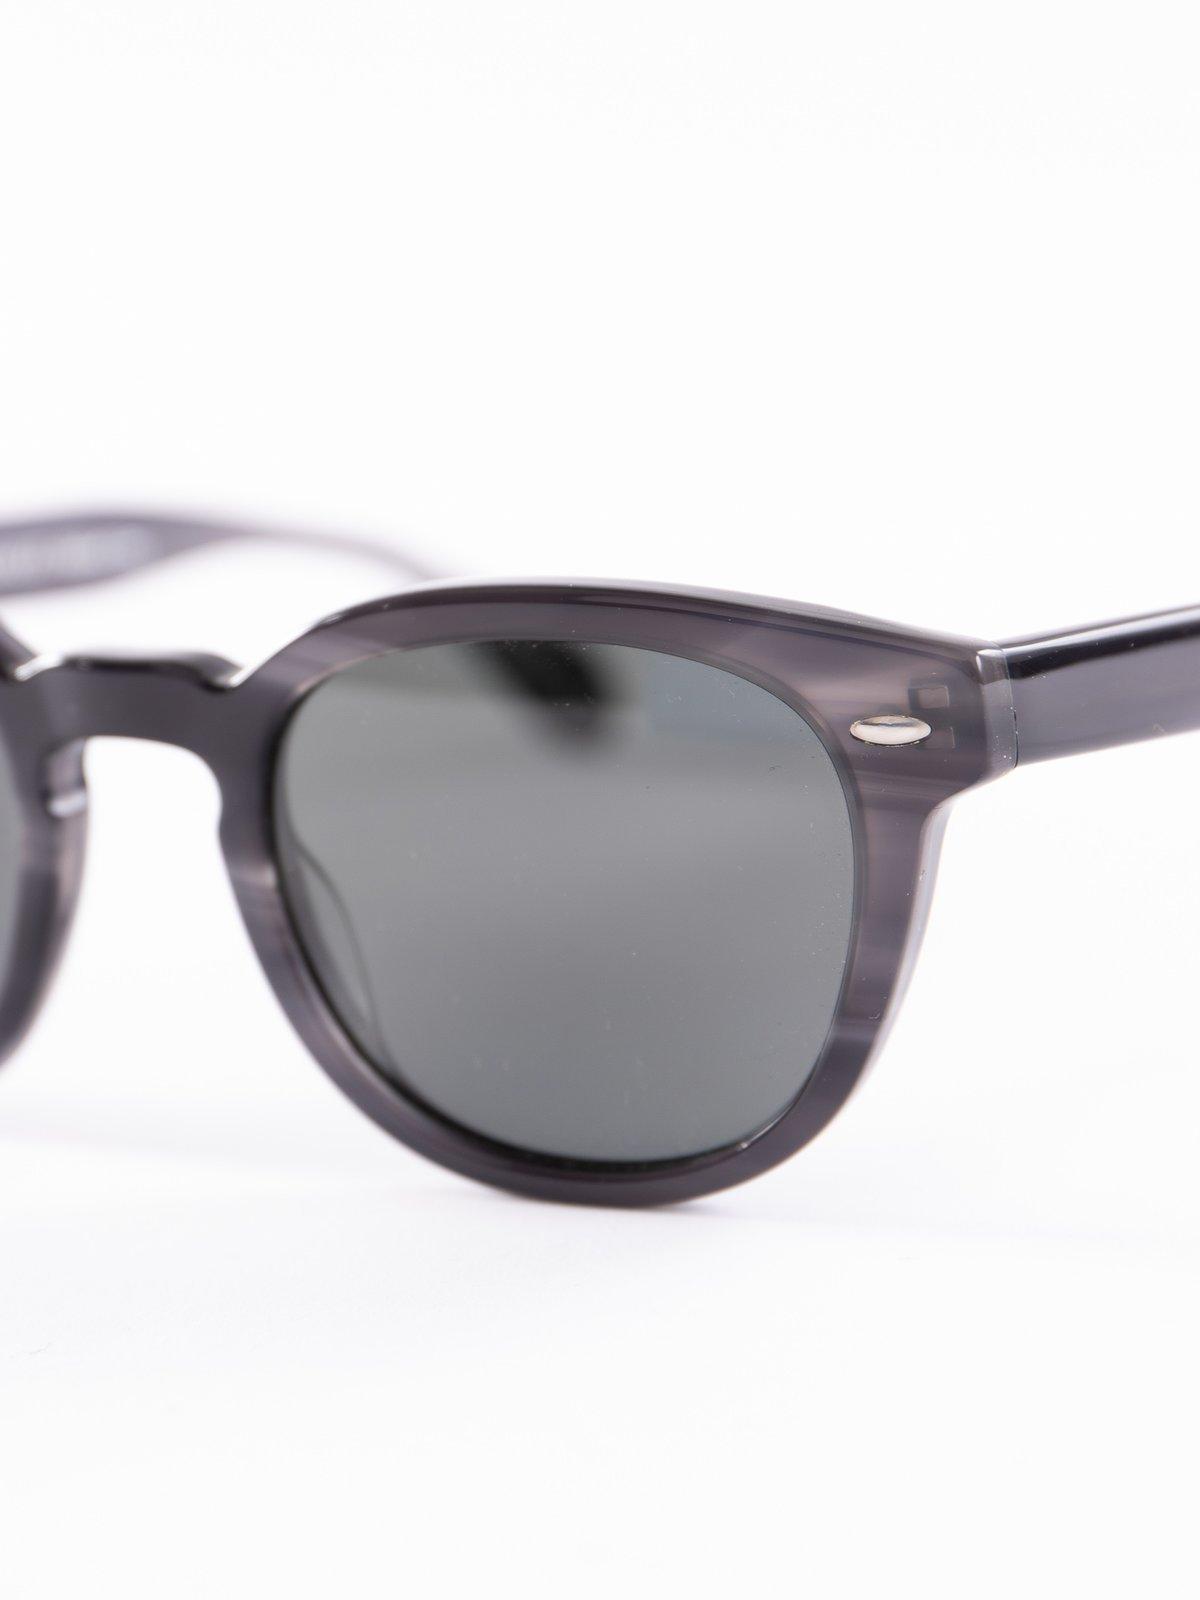 Charcoal Tortoise/Midnight Express Polar Sheldrake Sunglasses - Image 2